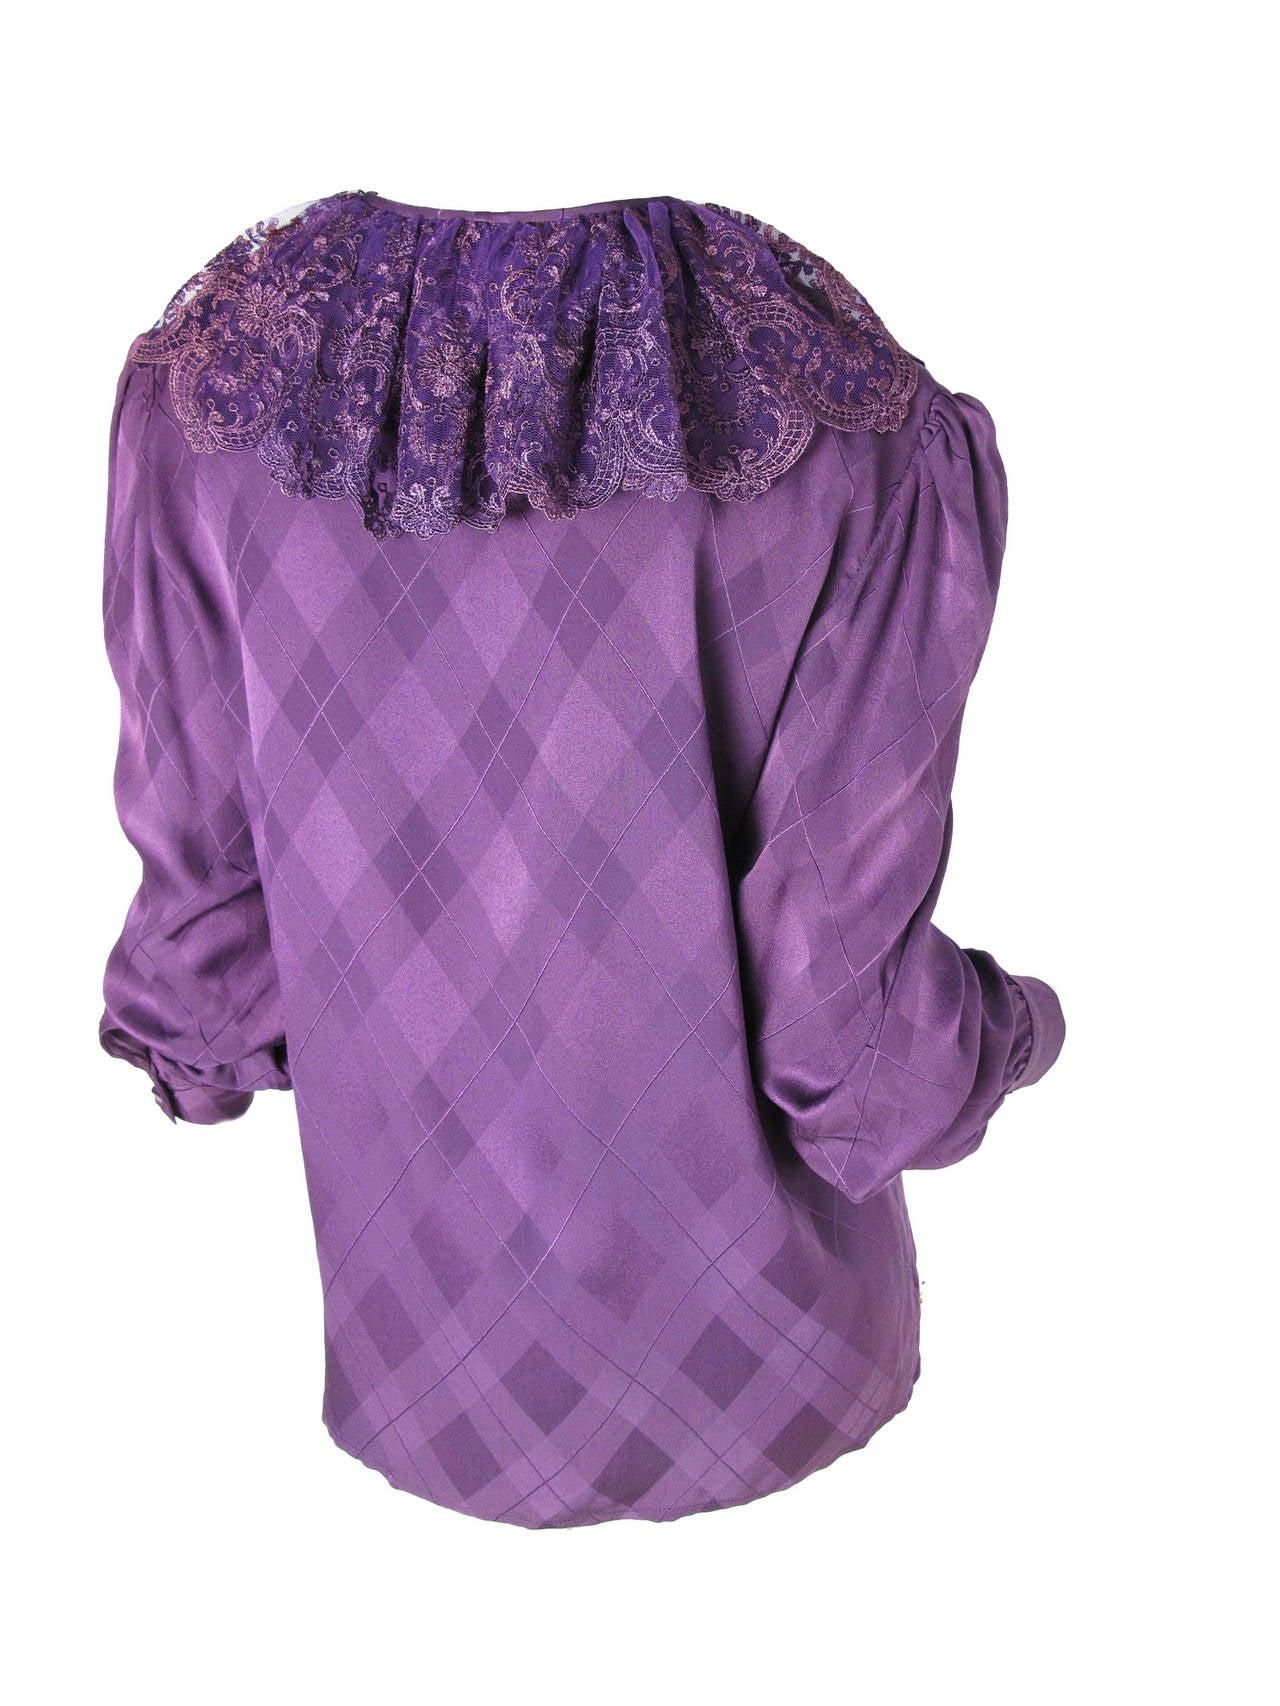 Valentino Purple Silk Blouse with Lace Collar 3